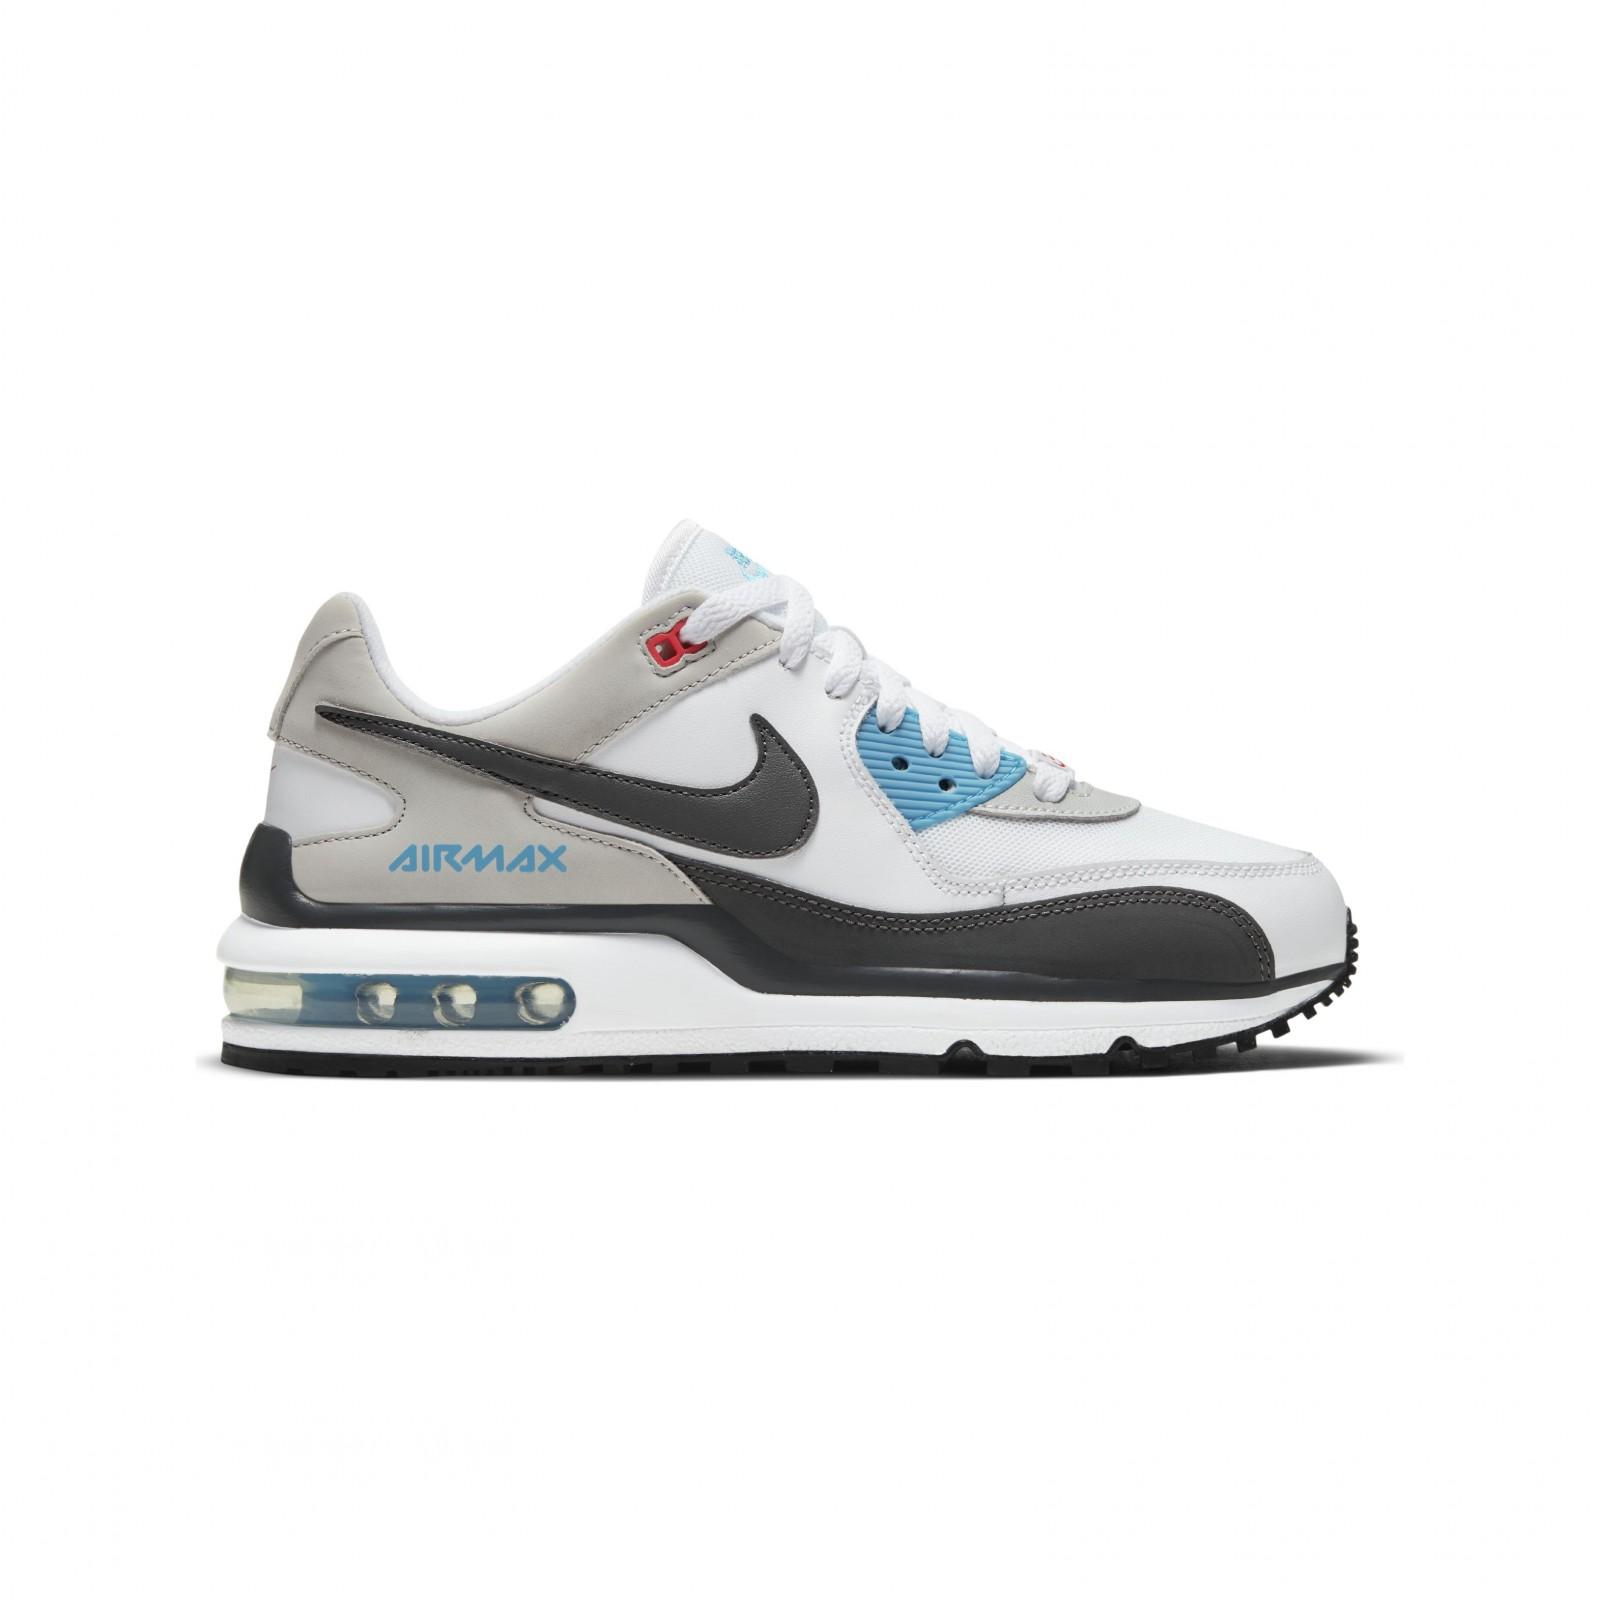 Nike Air Max Wright WHITE/IRON GREY-GREY FOG-CHLORINE BLUE